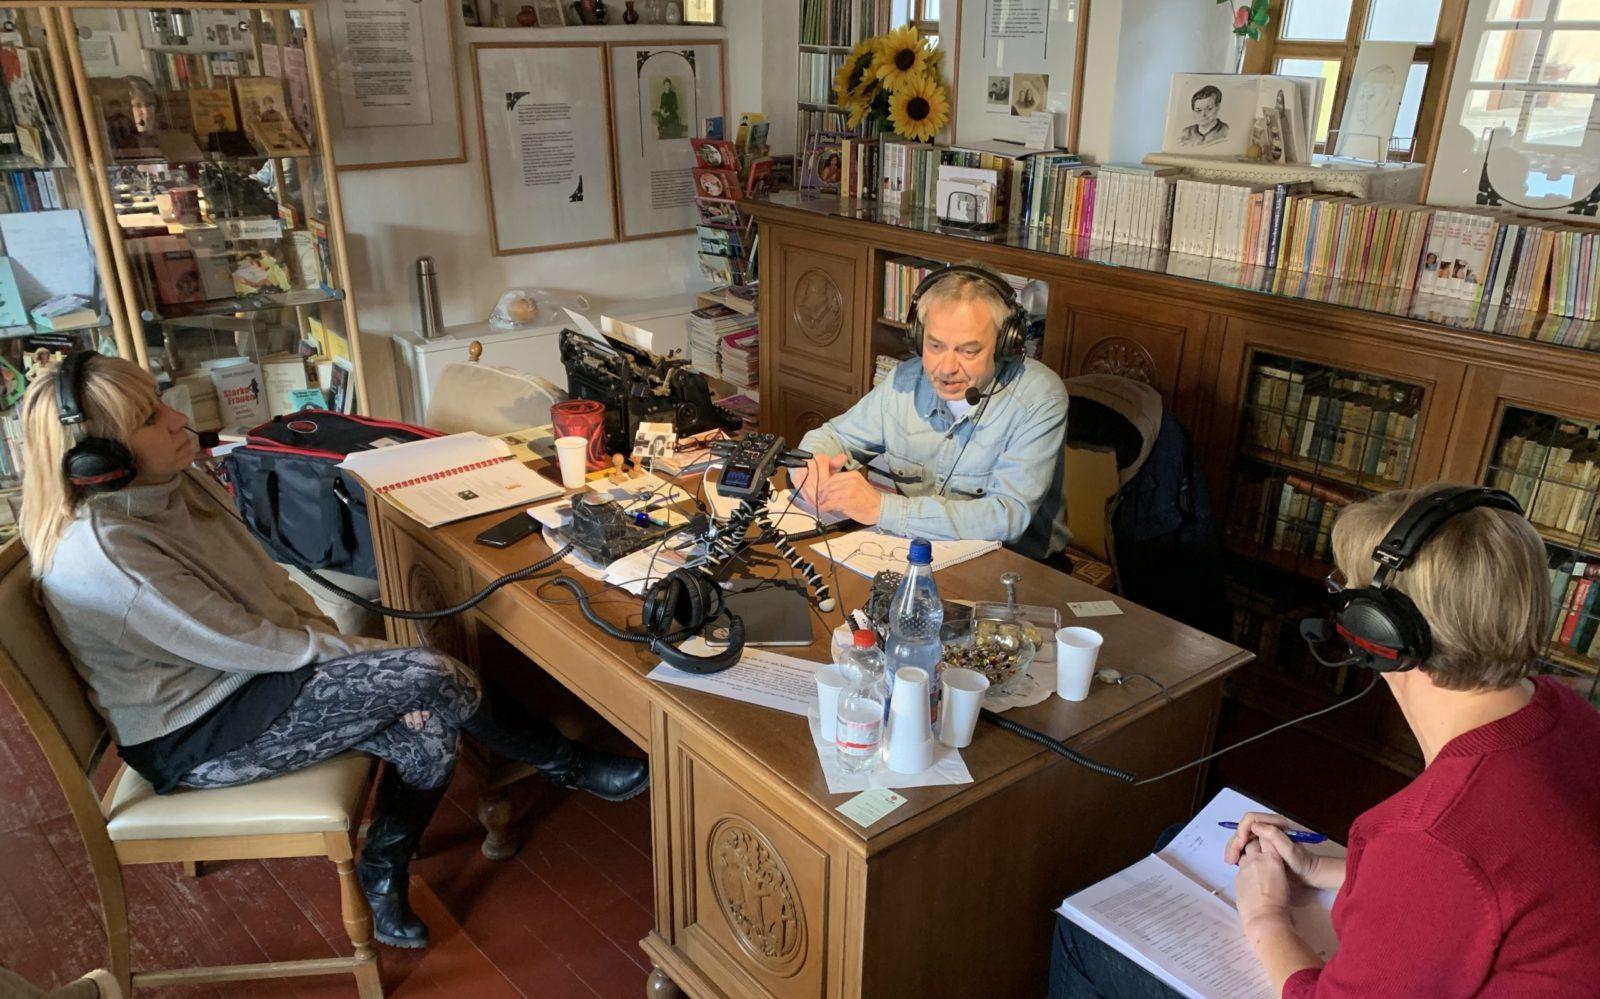 #frauenorte-der podcast-Aufnahme der Pilotfolge in Nebra vlnr Isabell Aurin-Miltschus / Norbert Schulz/ Anke Triller